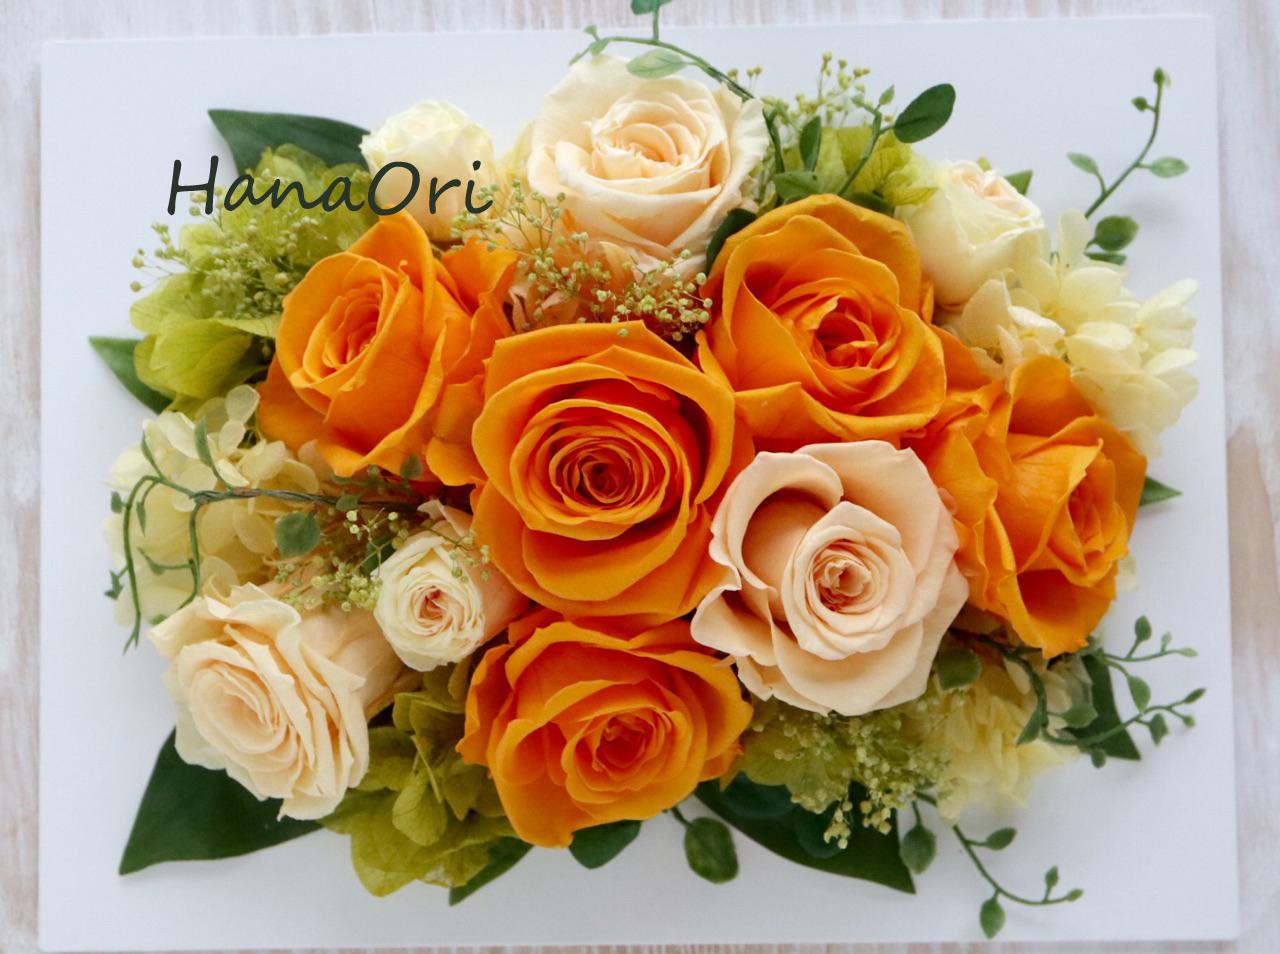 https://www.hanaori.com/blog1/images/2017.0510_4.jpg